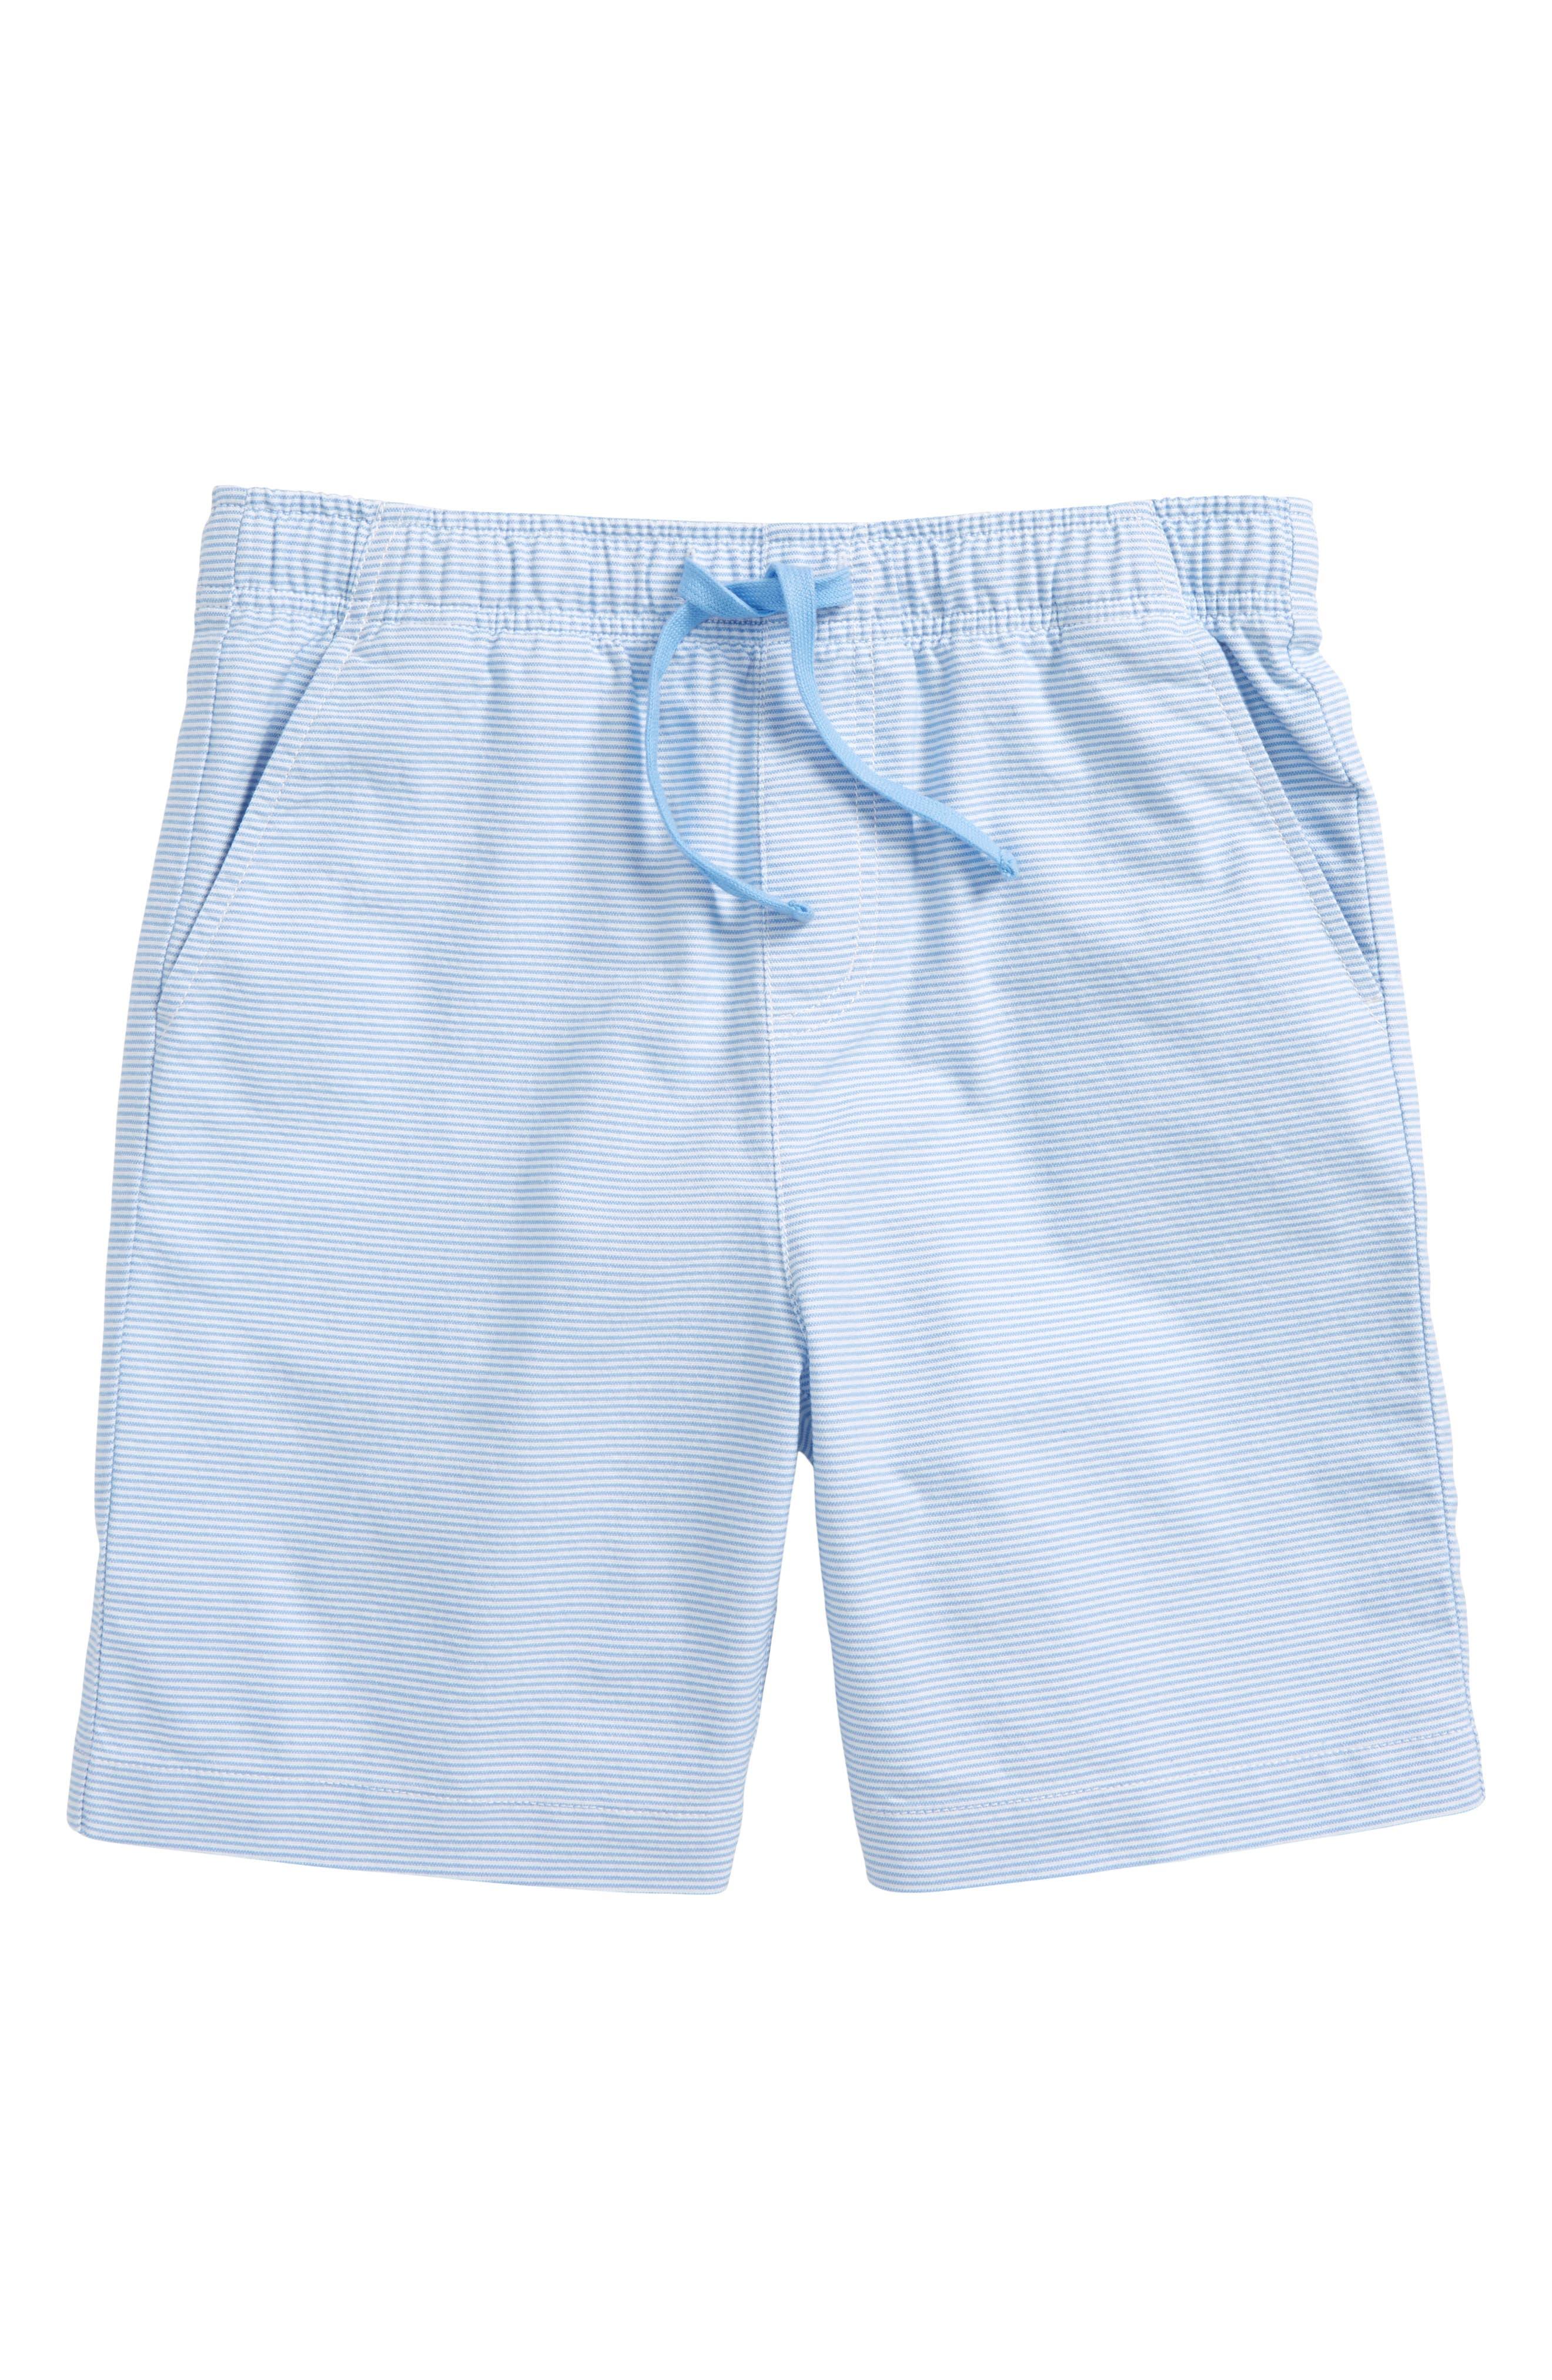 Oxford Stripe Jetty Shorts,                         Main,                         color, Ocean Breeze